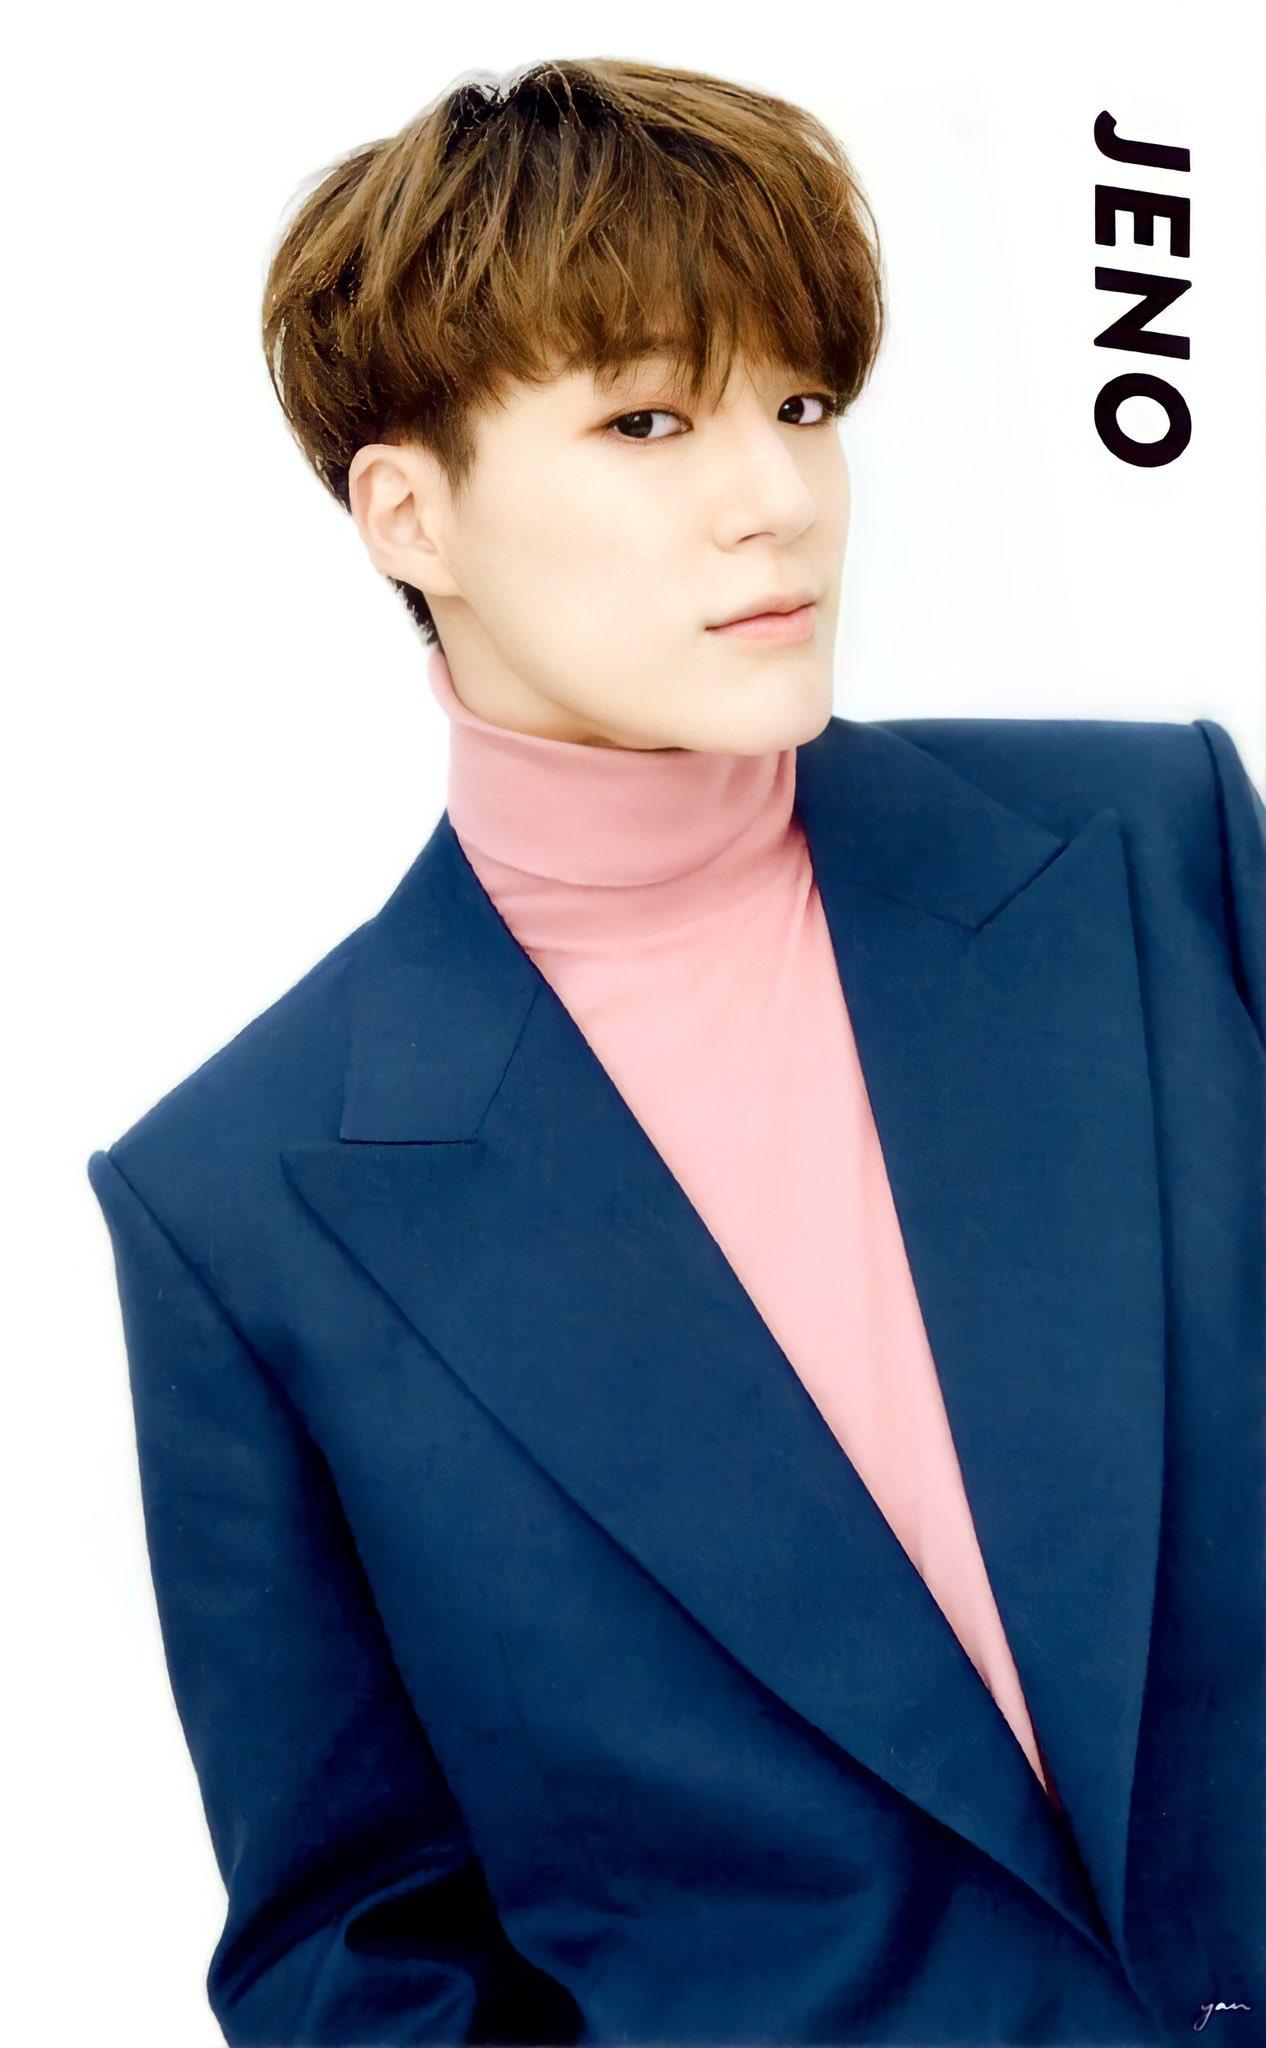 Jaemin ภาพถ่าย,Jaemin แนวโน้มของ Twitter - ทวีตด้านบน